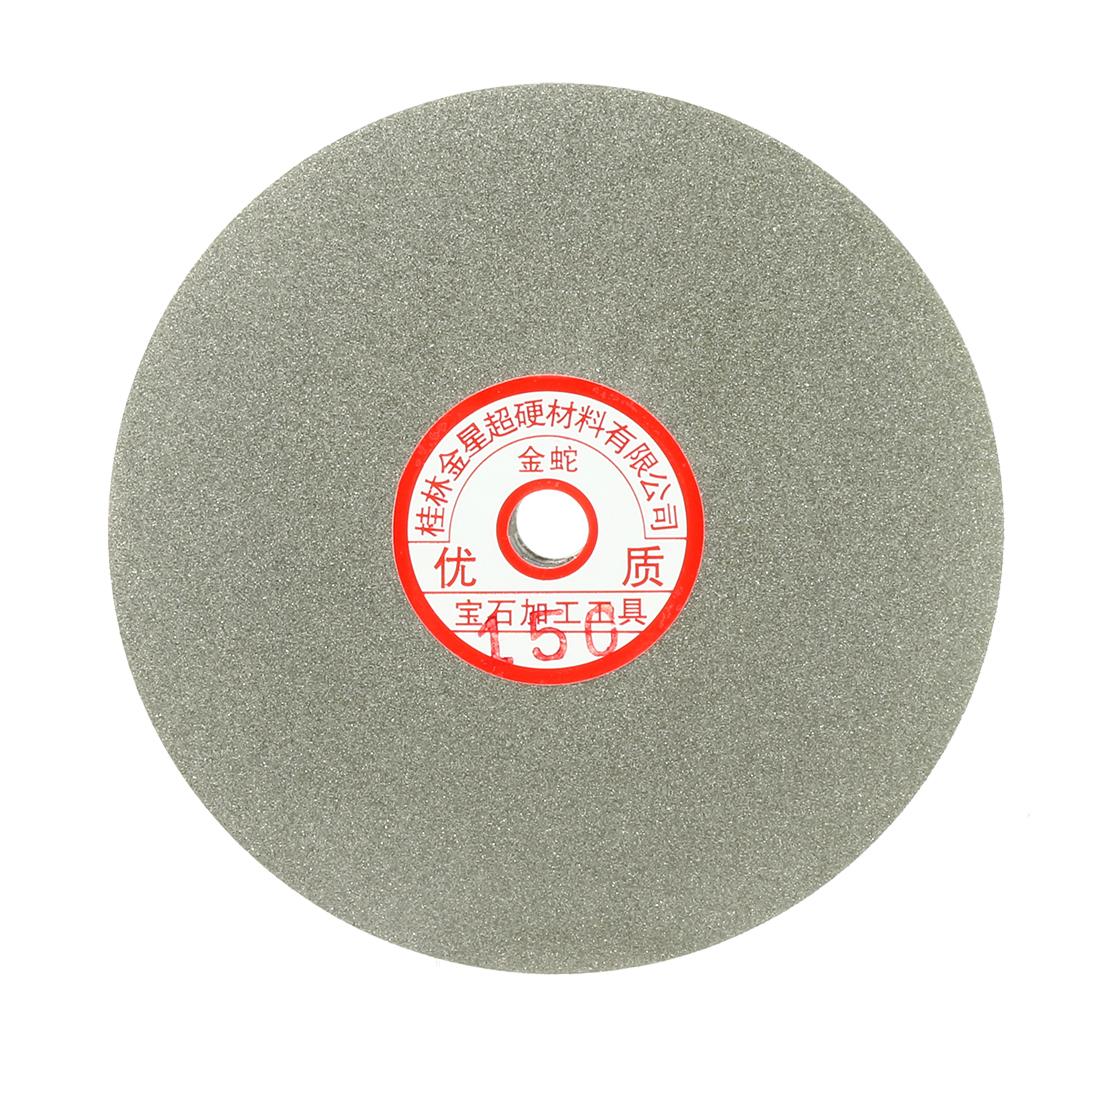 6-inch Grit 150 Diamond Coated Flat Lap Wheel Grinding Sanding Polishing Disc